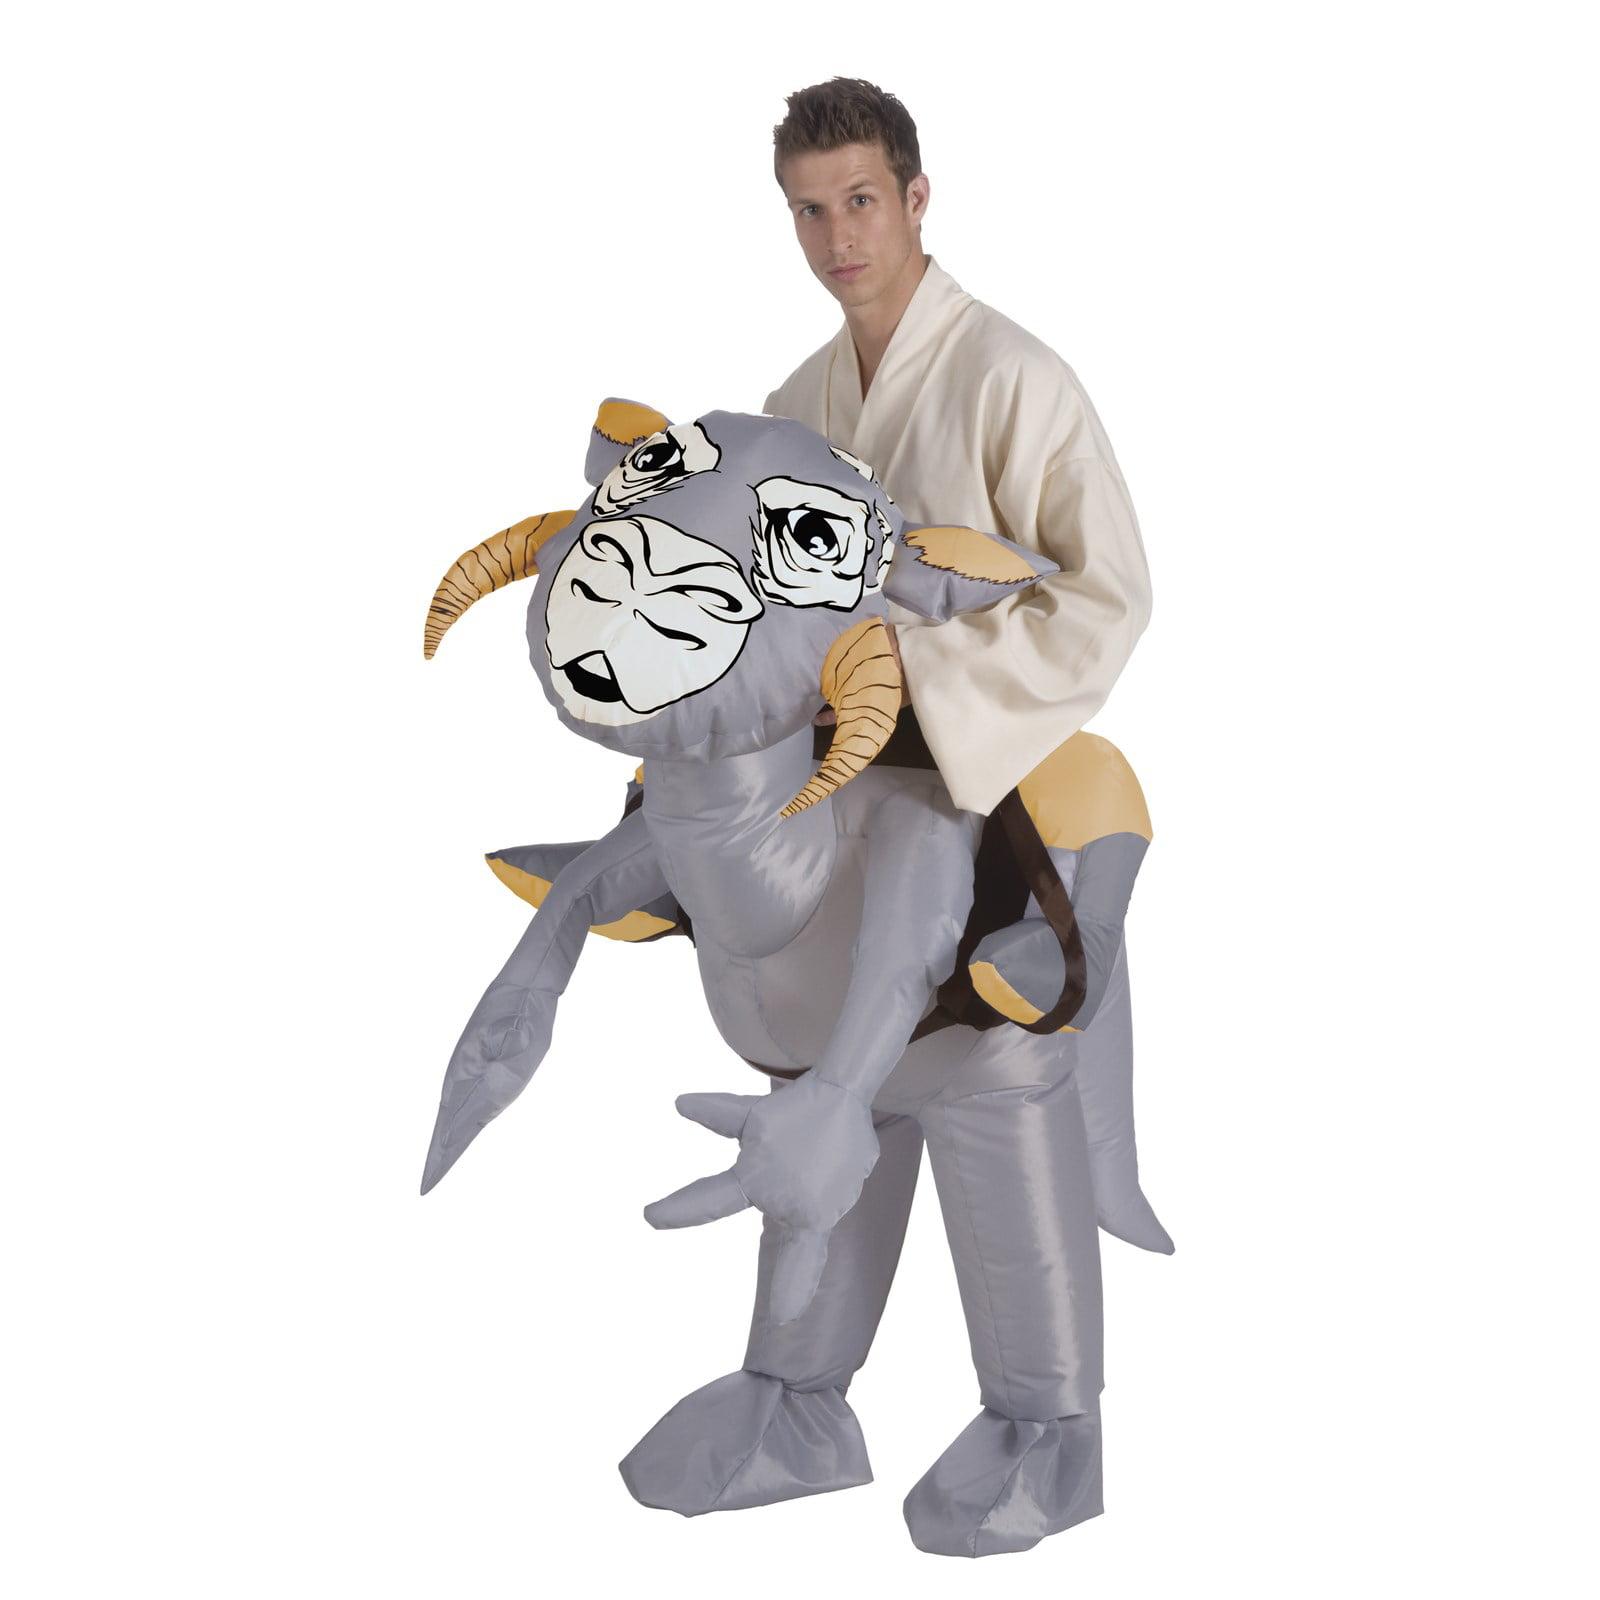 Star Wars Inflatable Tauntaun Men's Costume